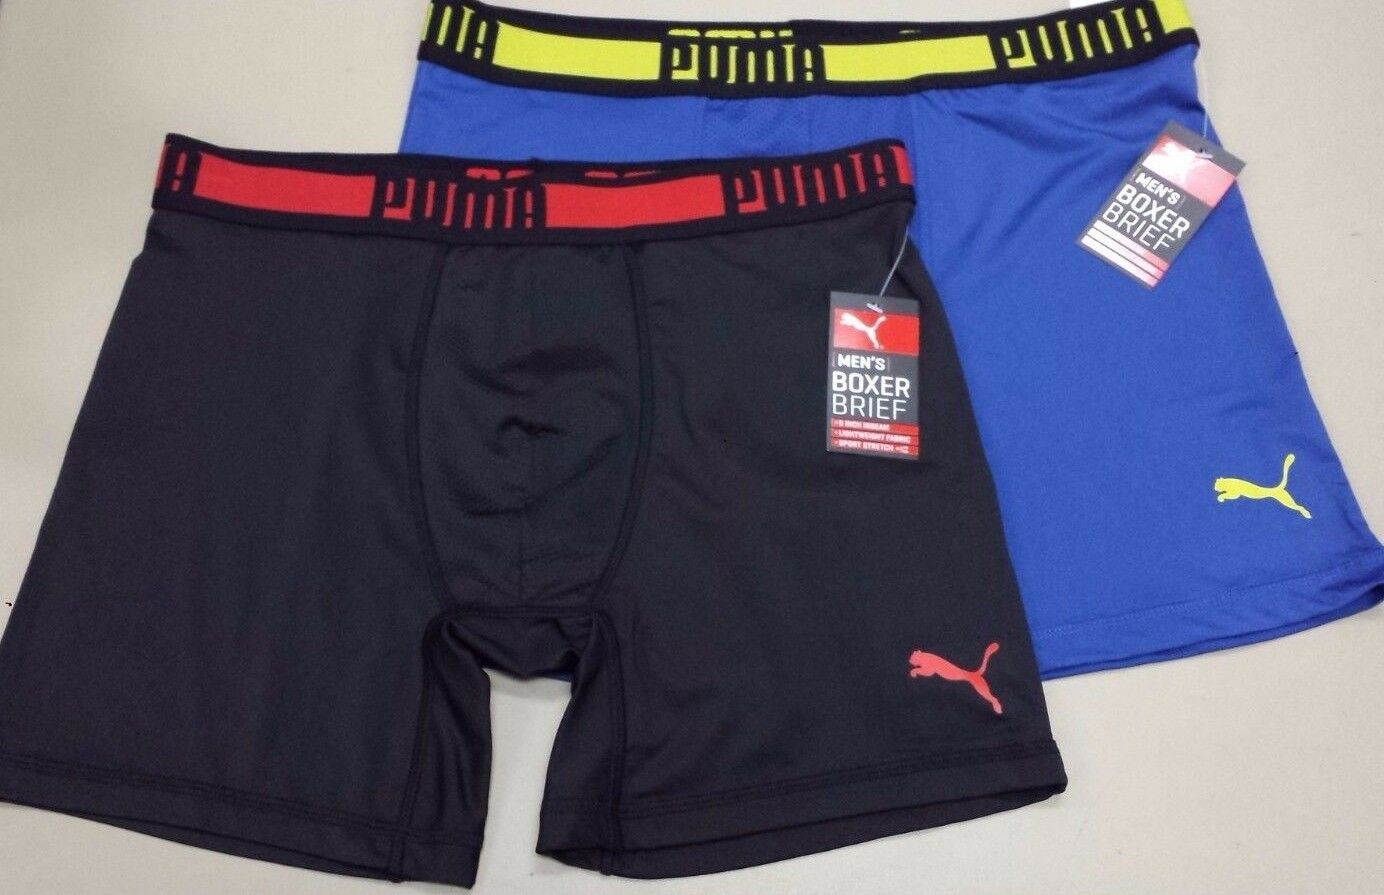 Puma Men's Athletic Performance Boxer Briefs Stretch Underwe